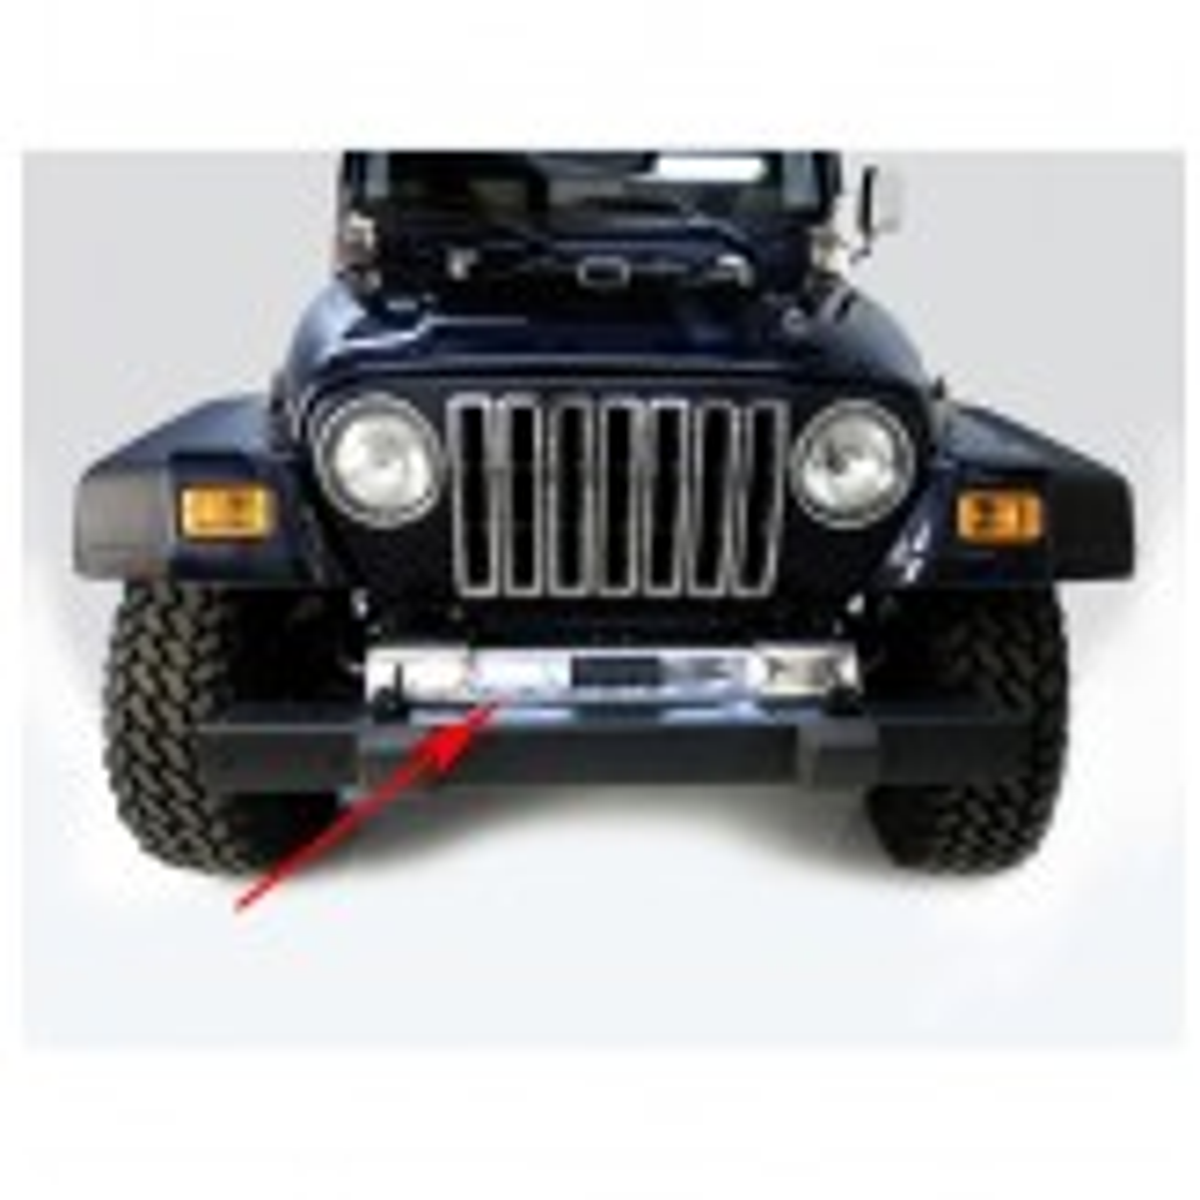 Front Frame Cover Stainless Steel 97-06 Jeep TJ/LJ Wrangler